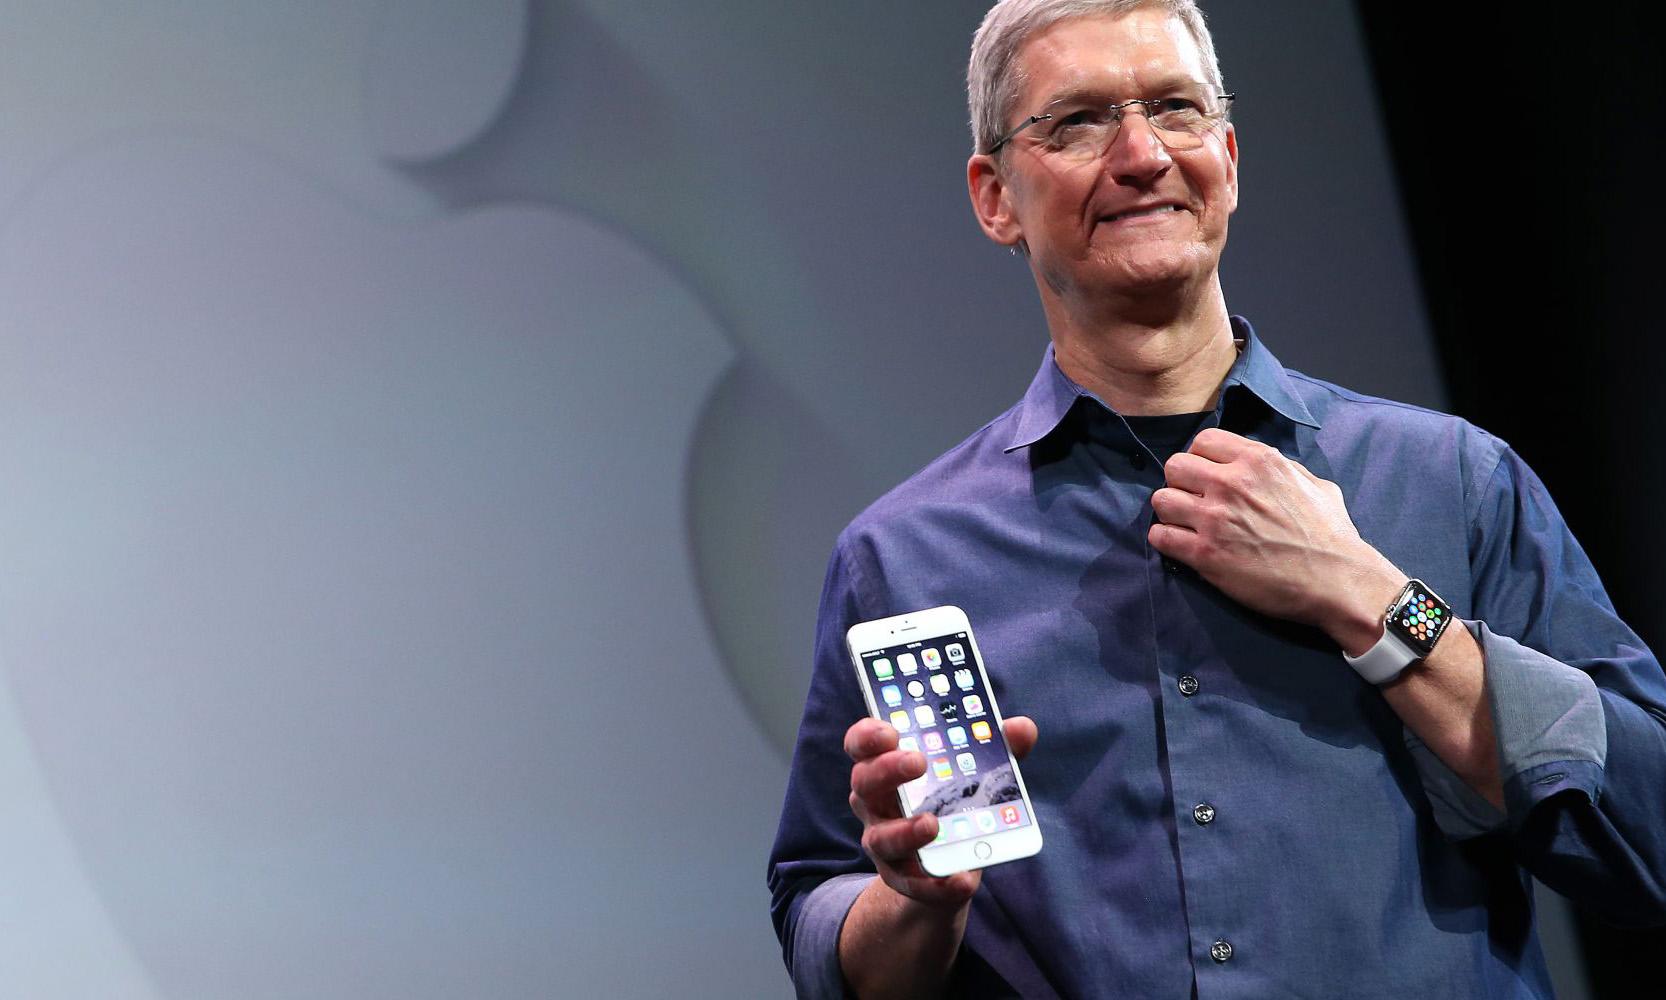 iPhone 去年更换电池数量超过去 10 倍